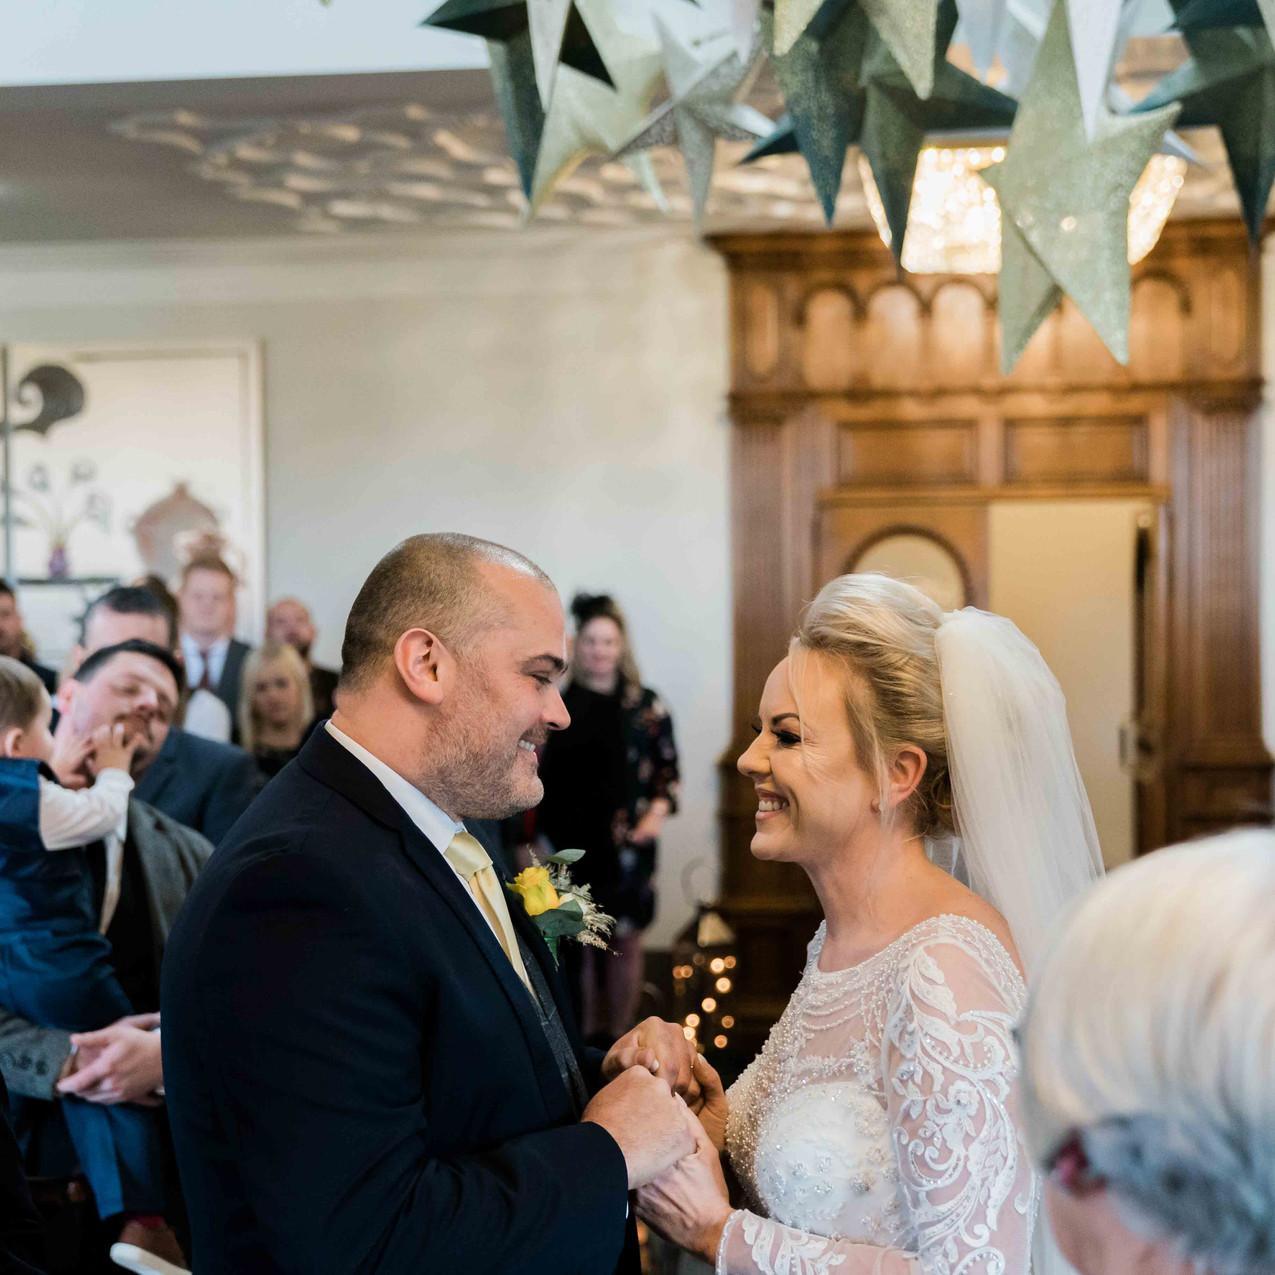 Saddleworth Hotel wedding ceremony